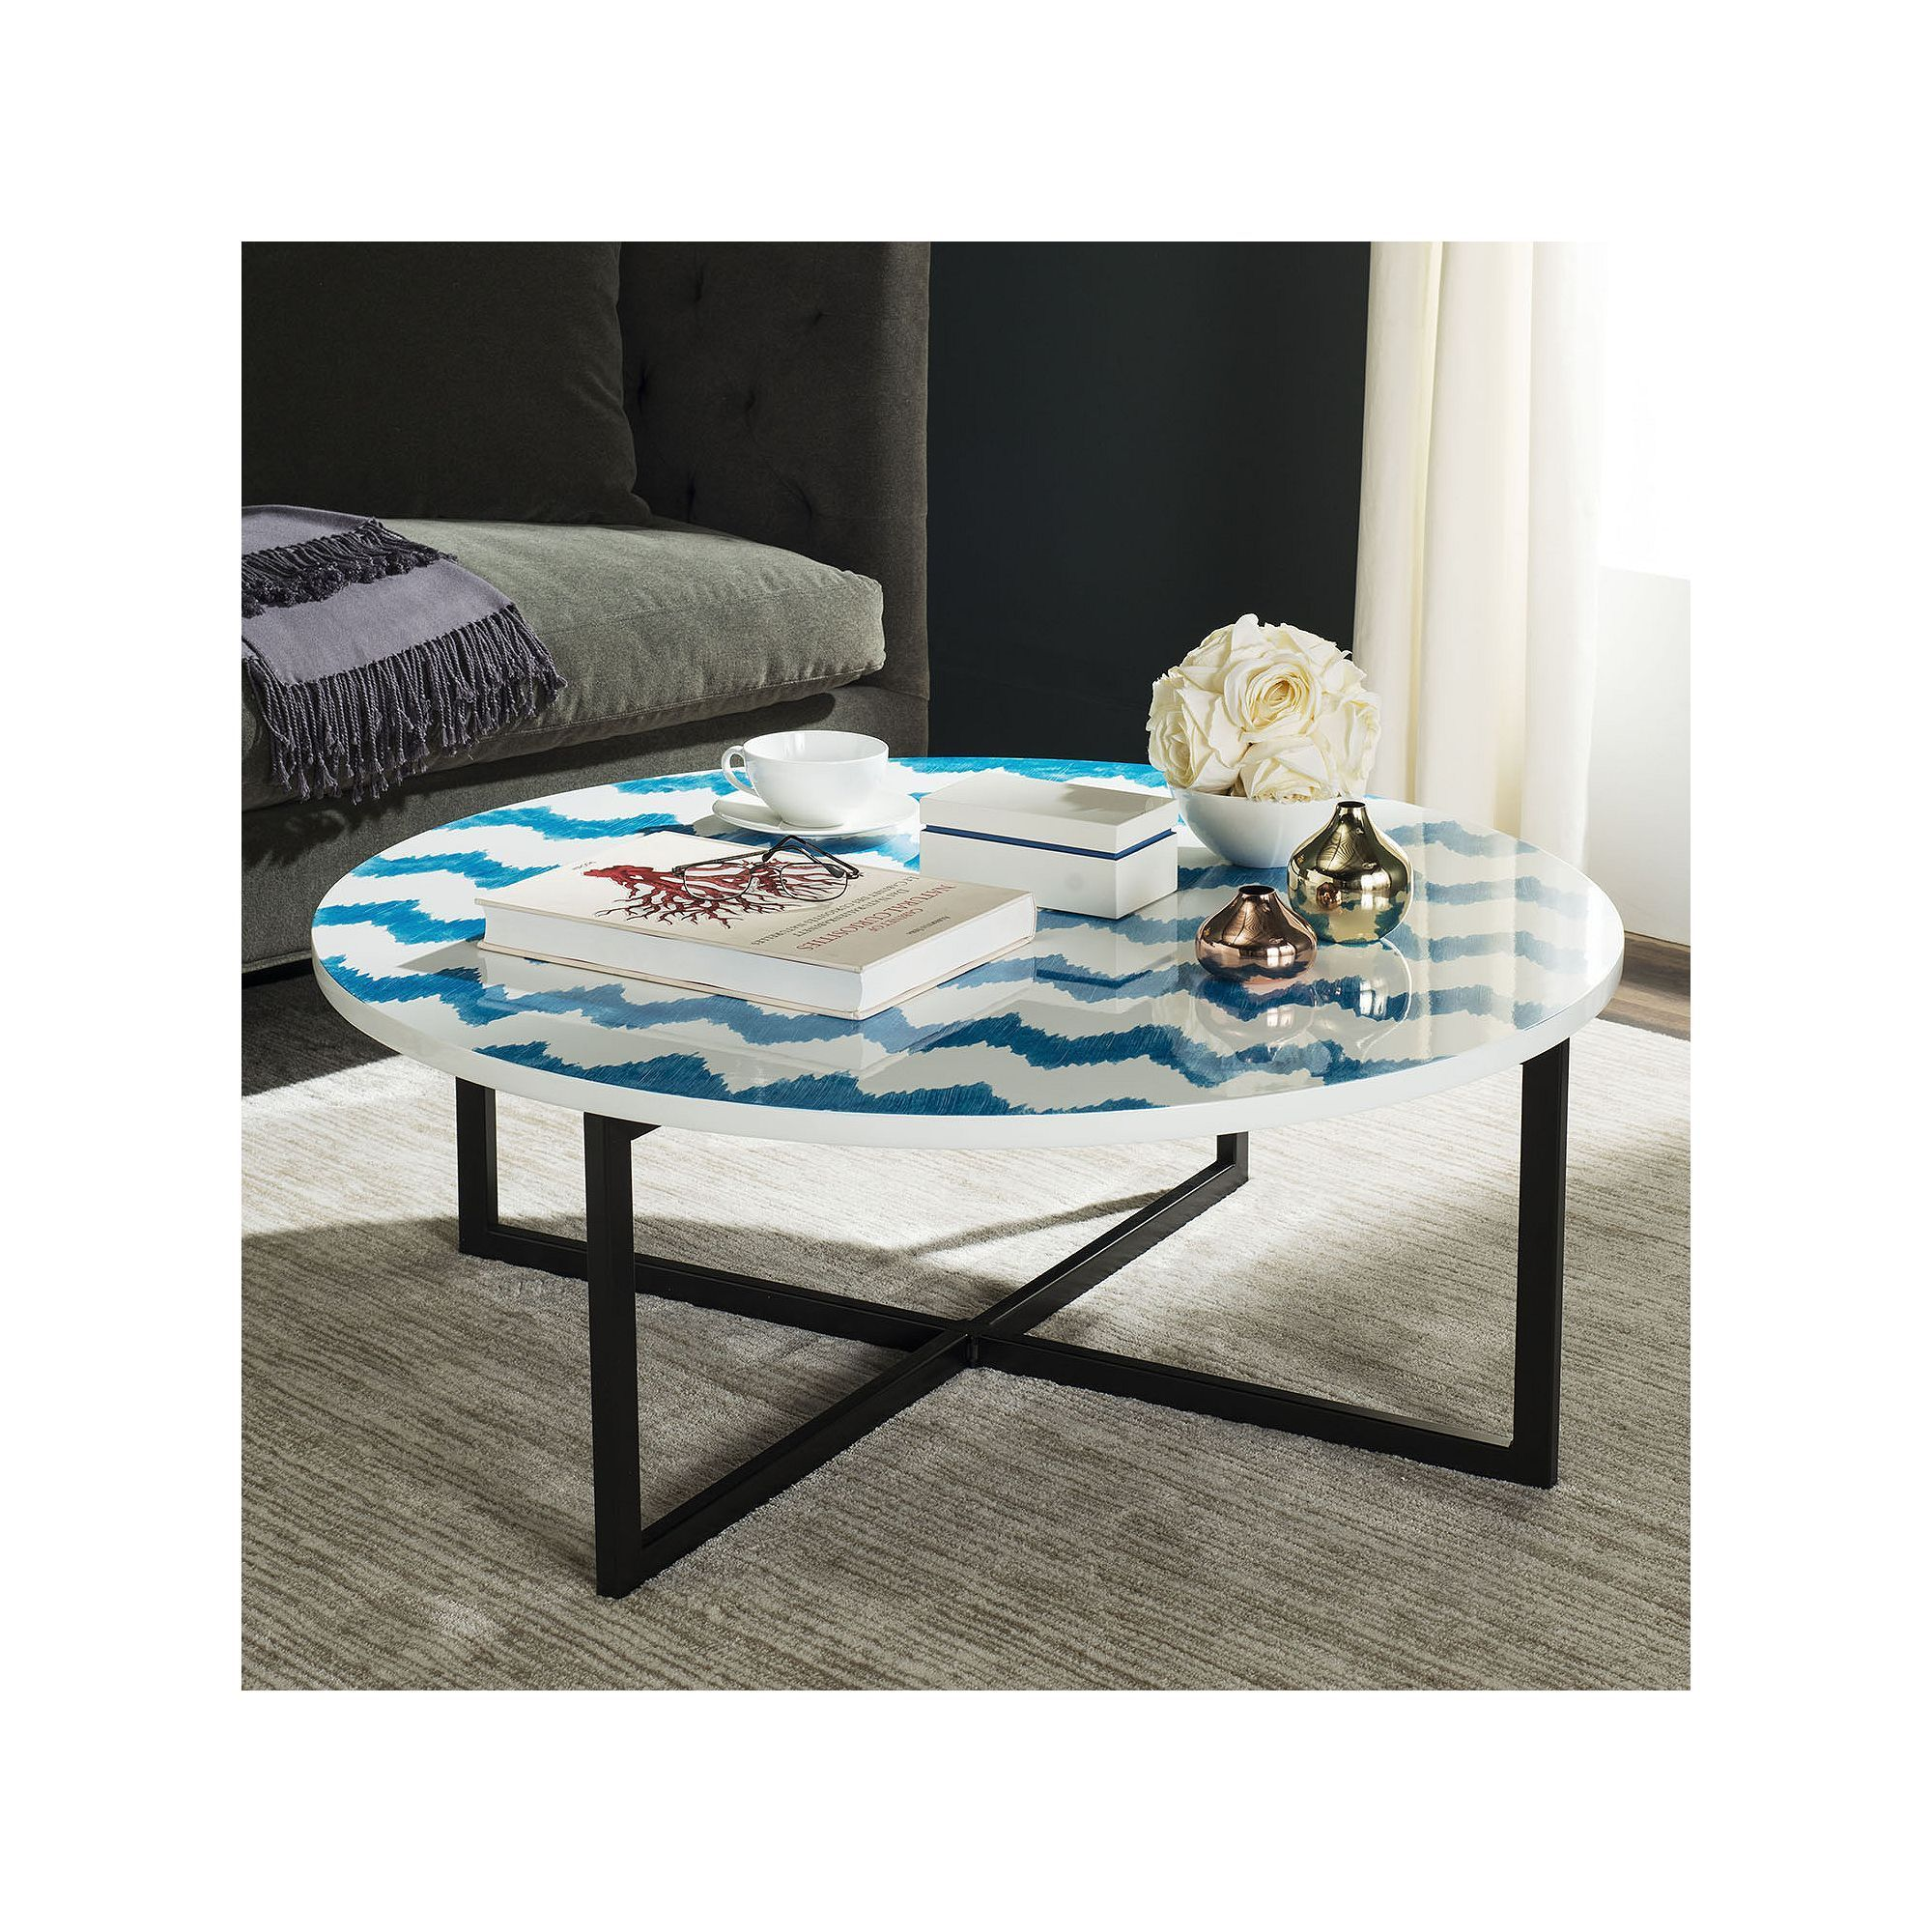 Safavieh Chevron Round Coffee Table Coffee Table Round Coffee Table Coffee Table With Storage [ 2000 x 2000 Pixel ]